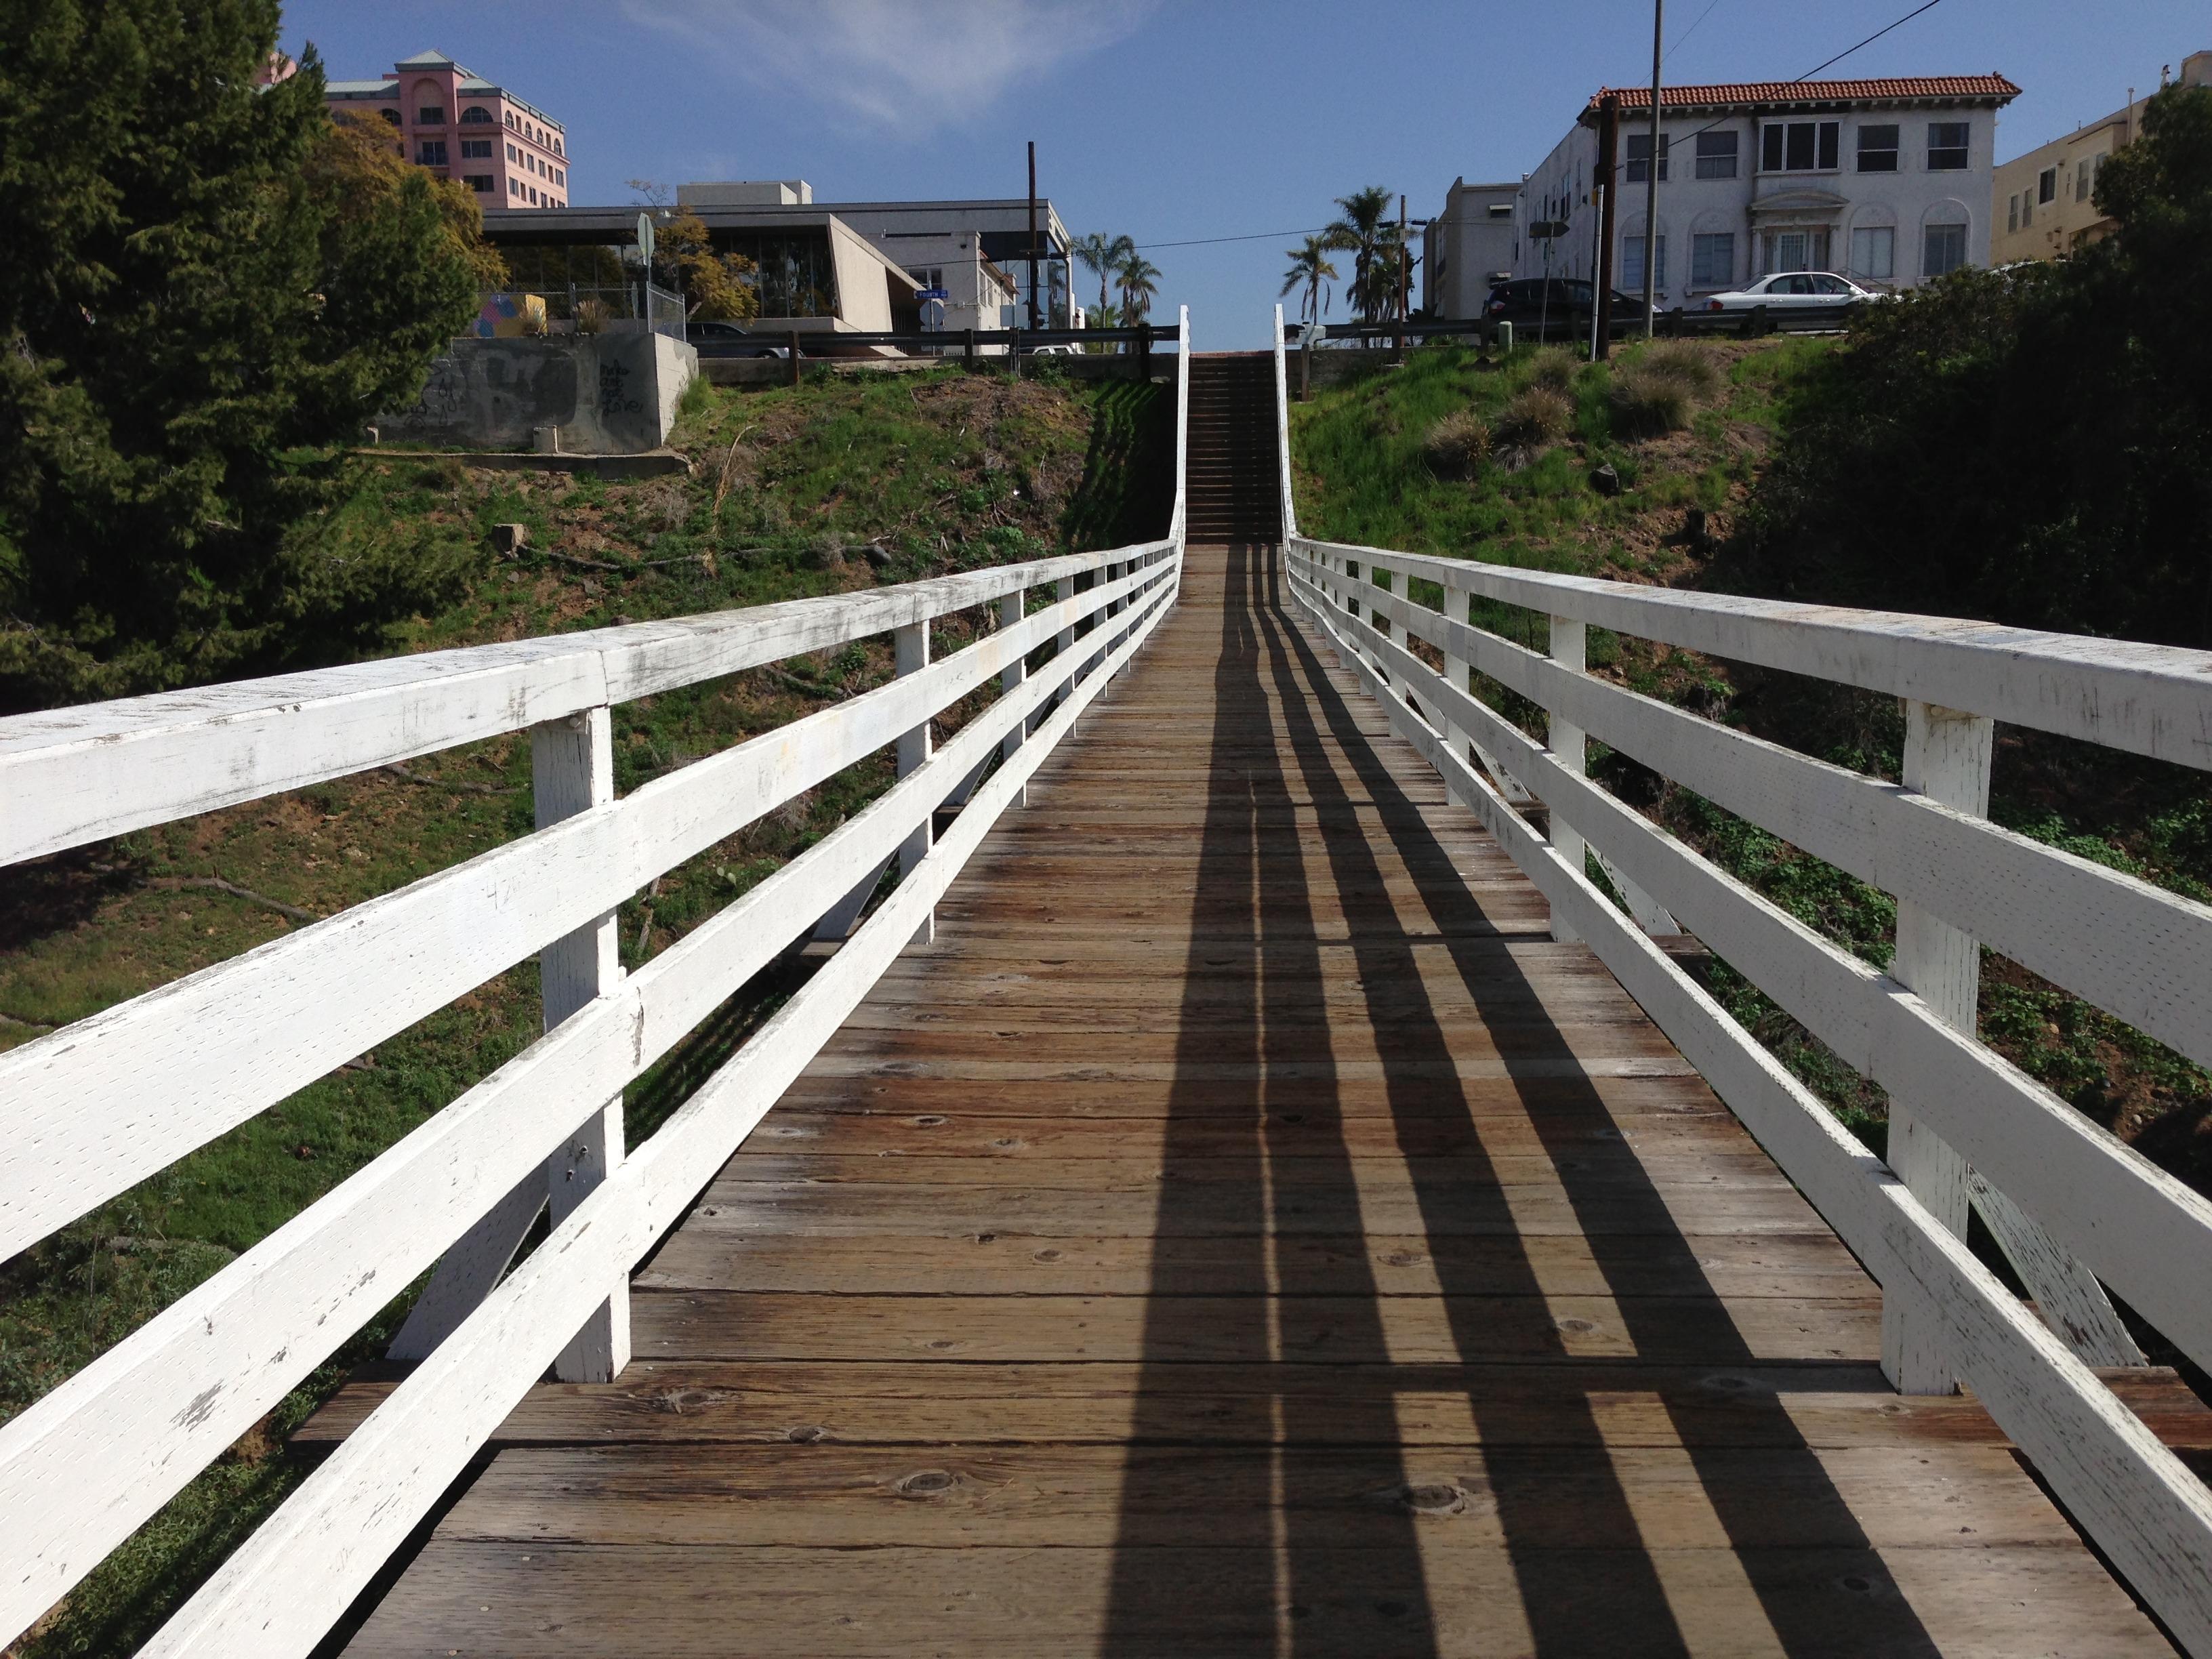 Kostenlose foto Pfad draussen Zaun Promenade Holz Spur